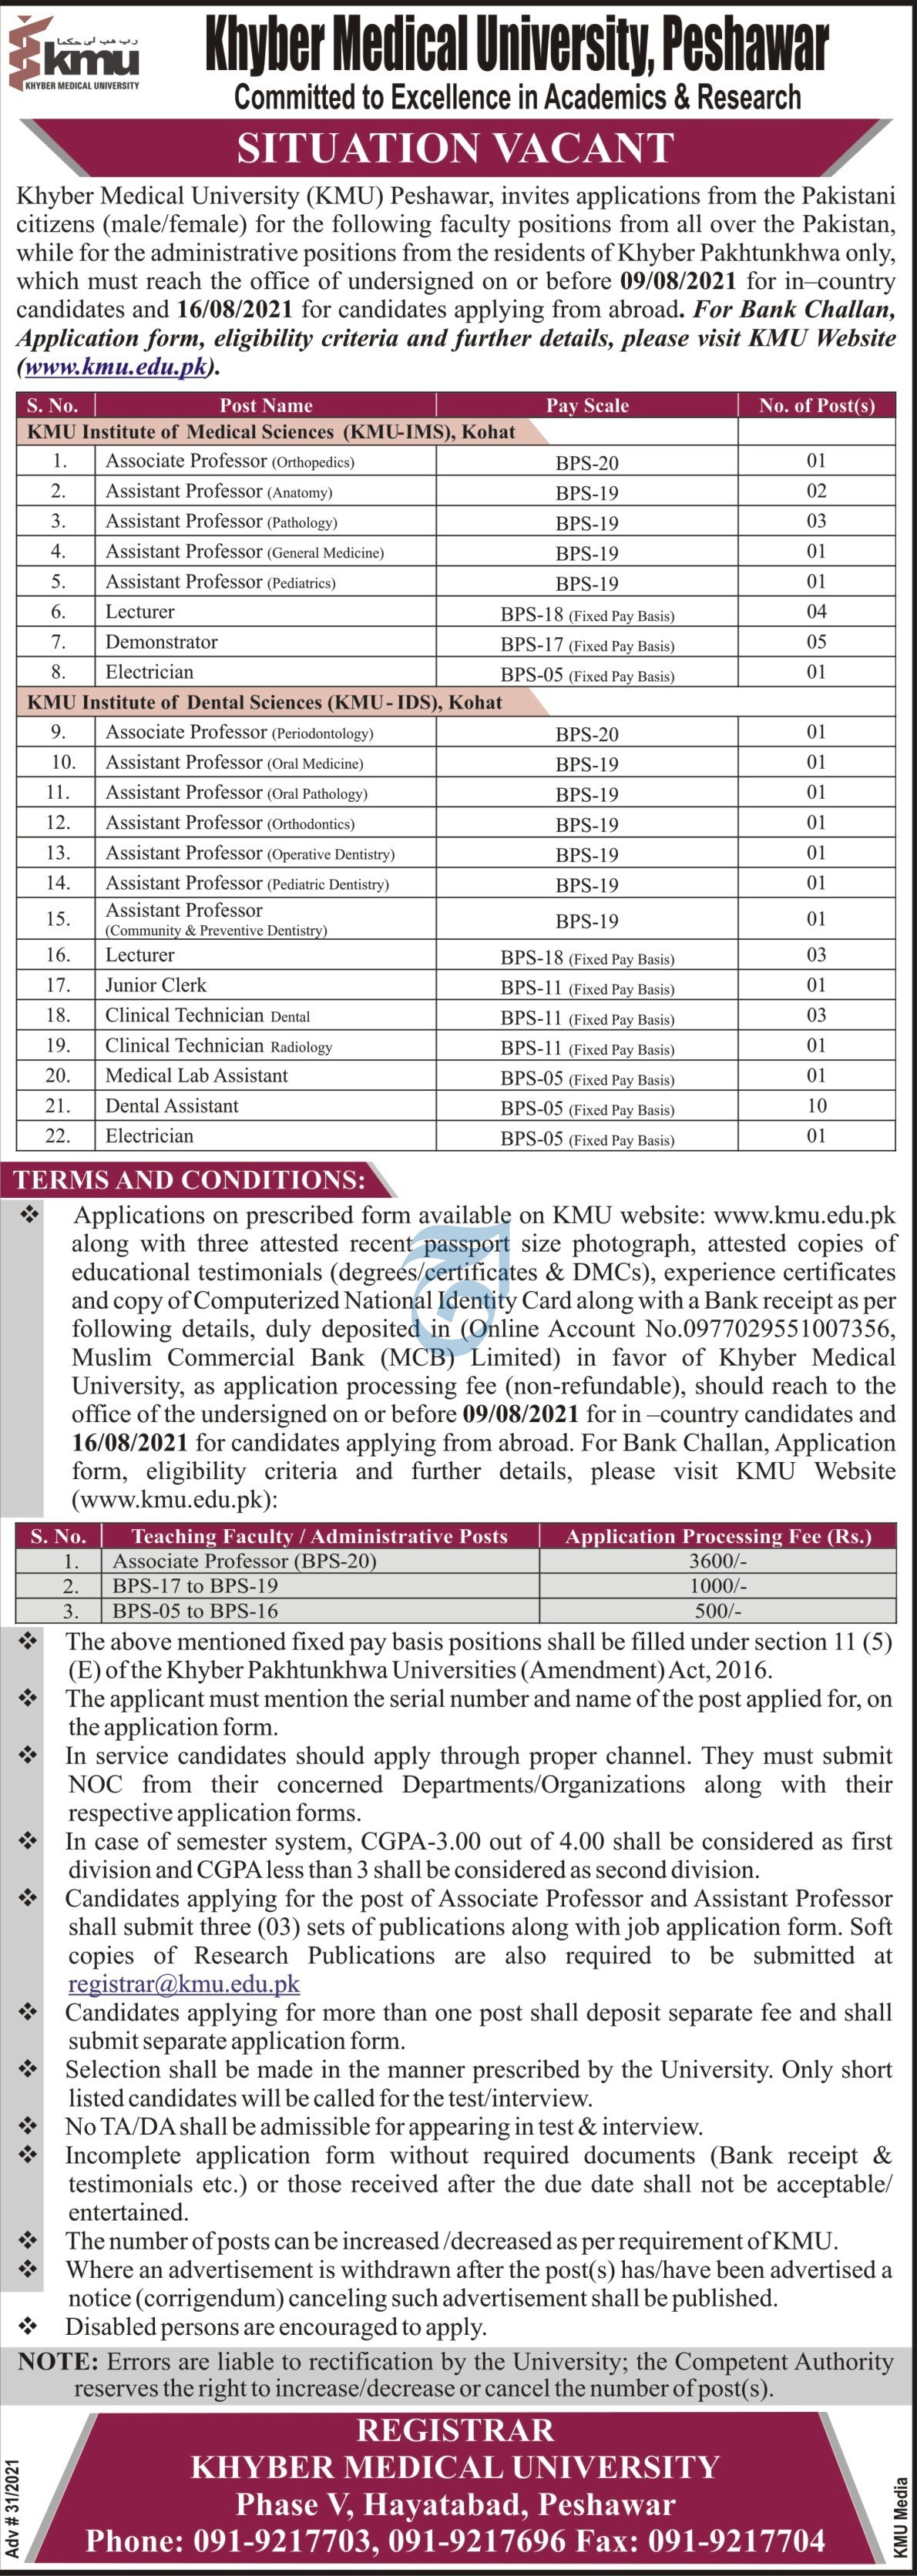 Khyber Medical University jobs newspaper ad for Lecturer in Peshawar on 2021-07-20